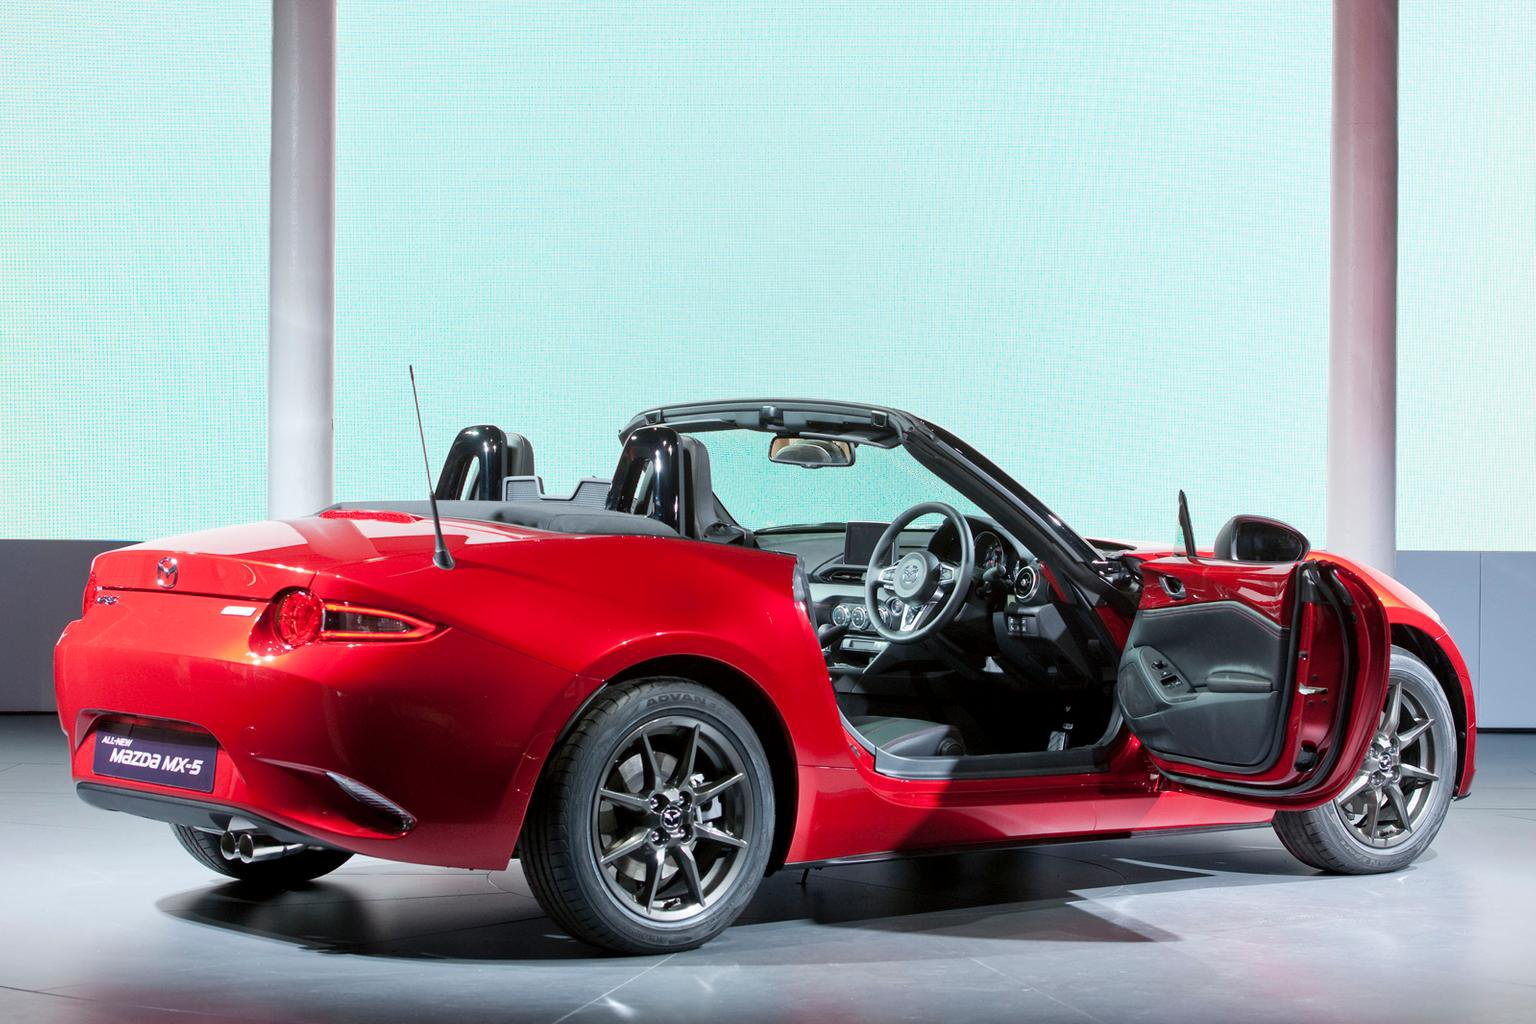 Mazda MX-5 - first impressions